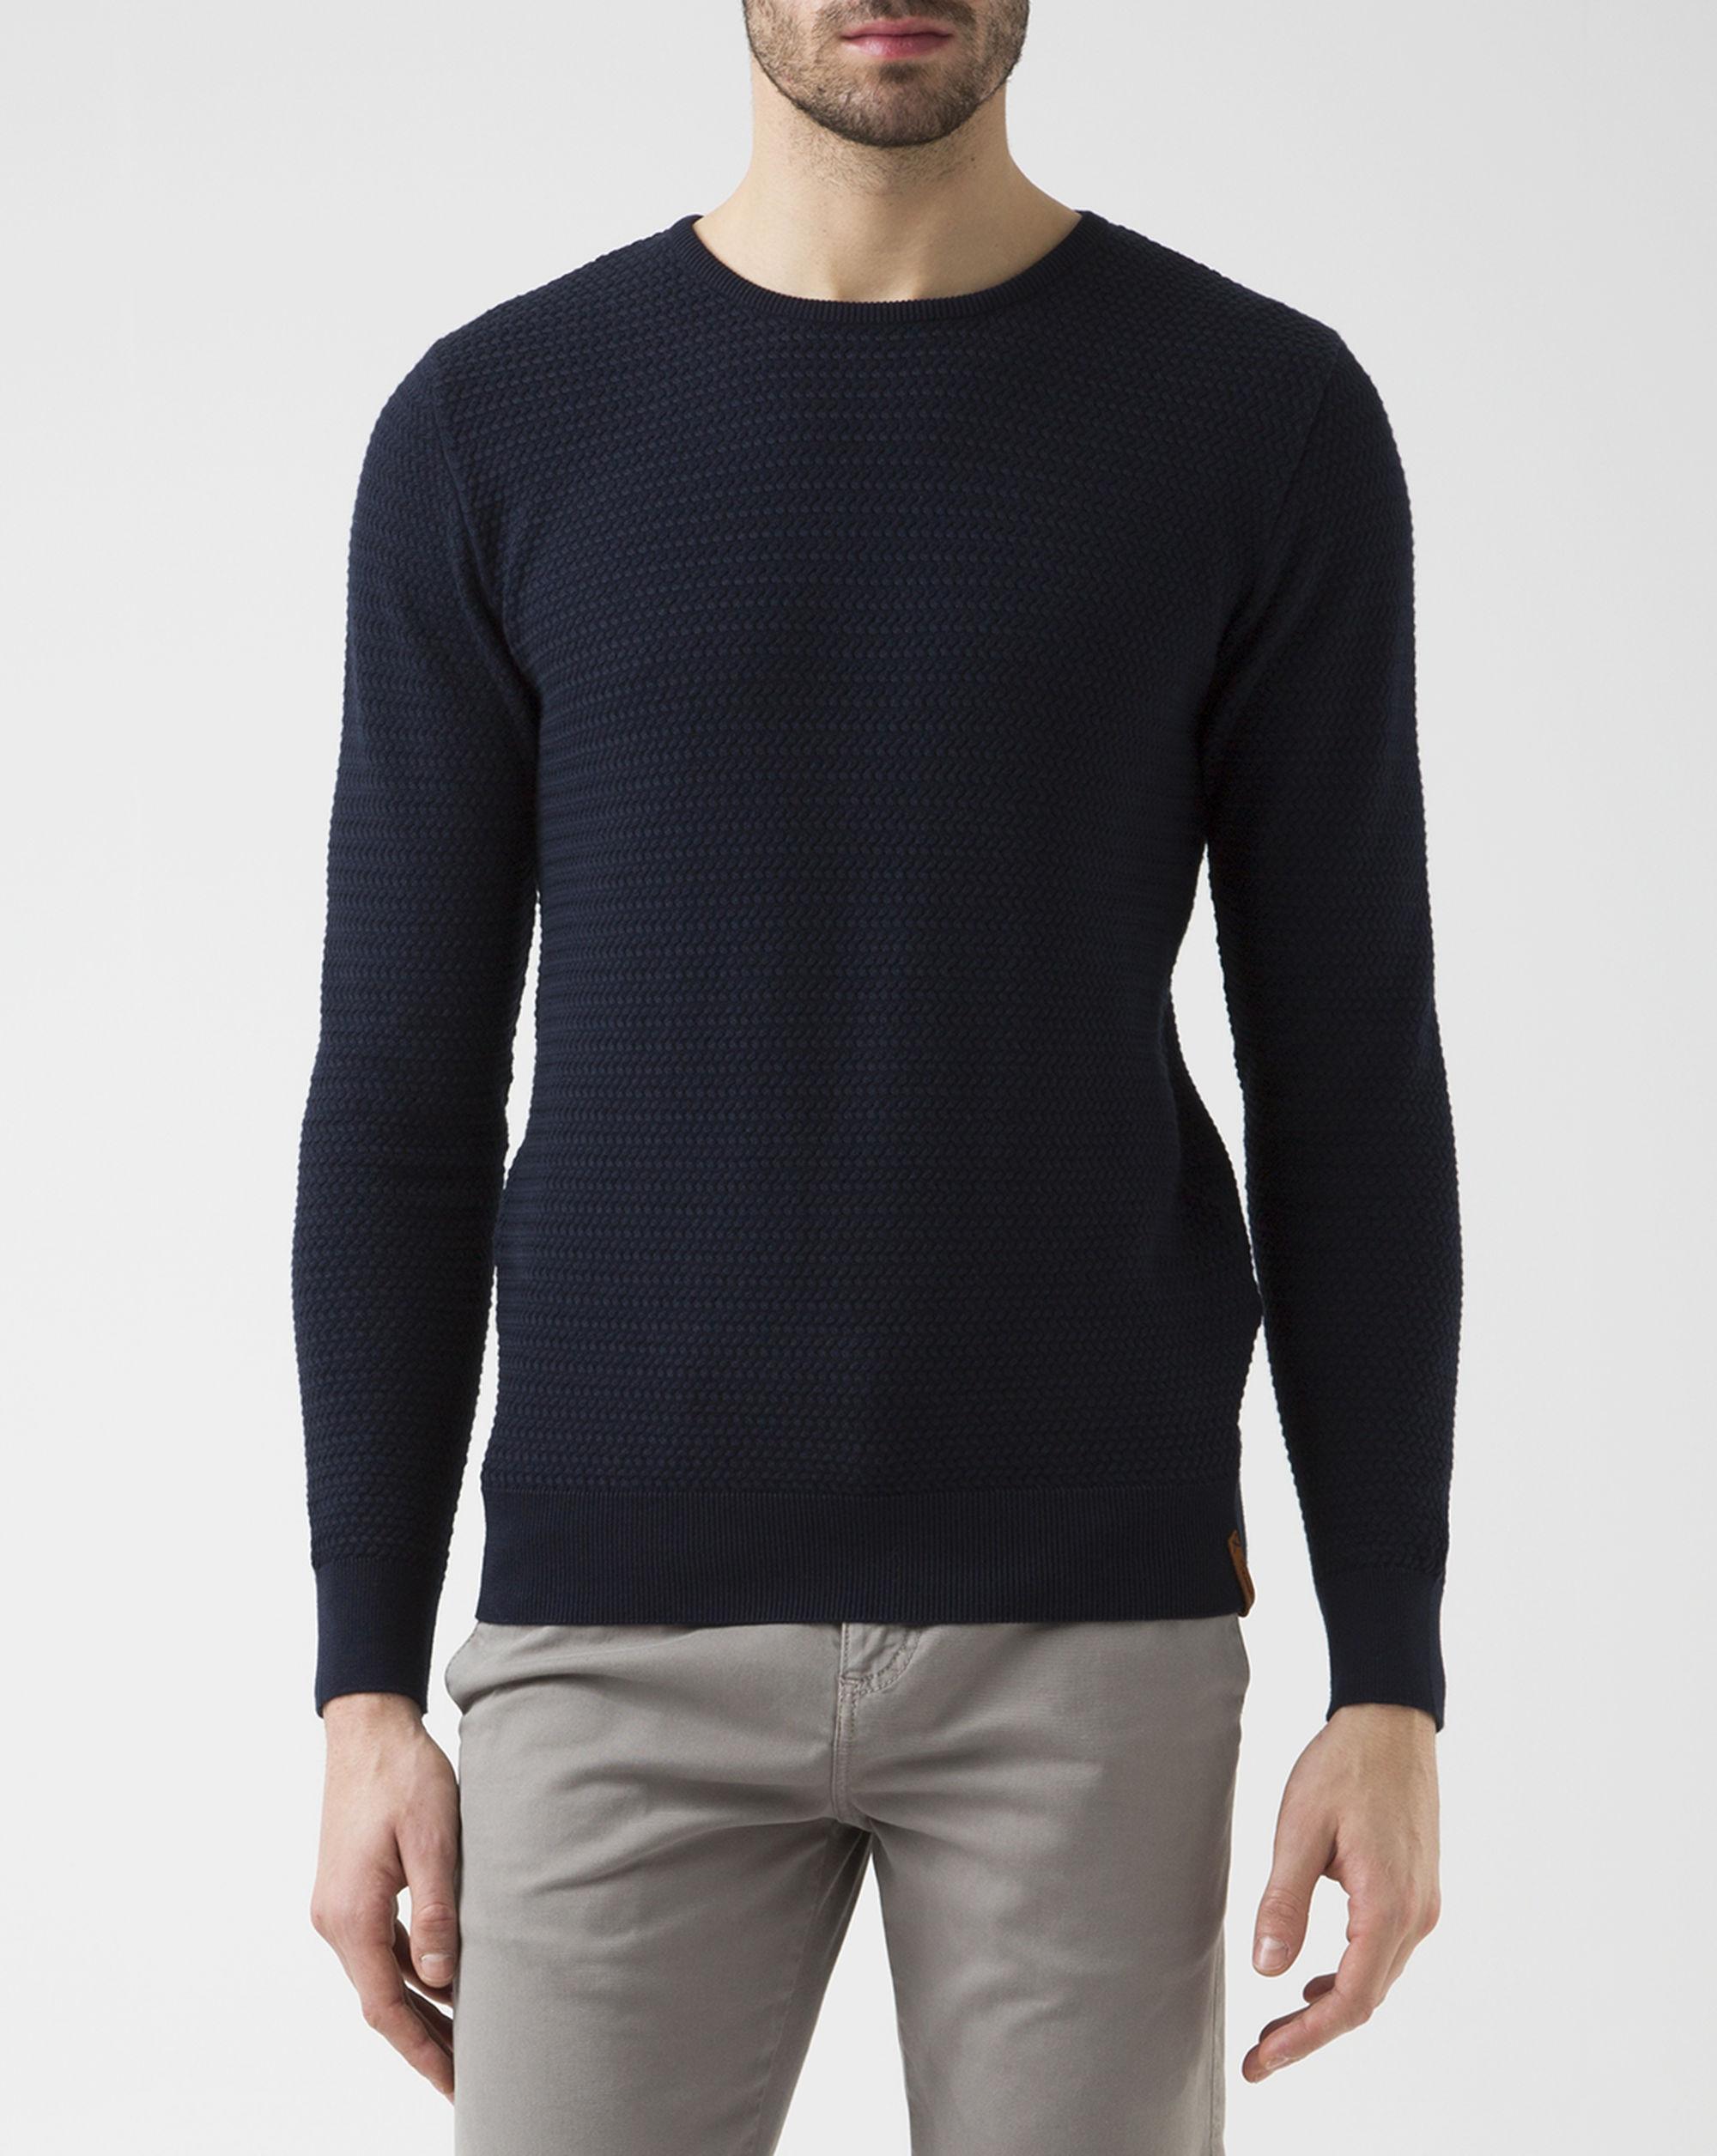 knowledge cotton apparel navy blue crew neck zig zag sweater in blue for men lyst. Black Bedroom Furniture Sets. Home Design Ideas